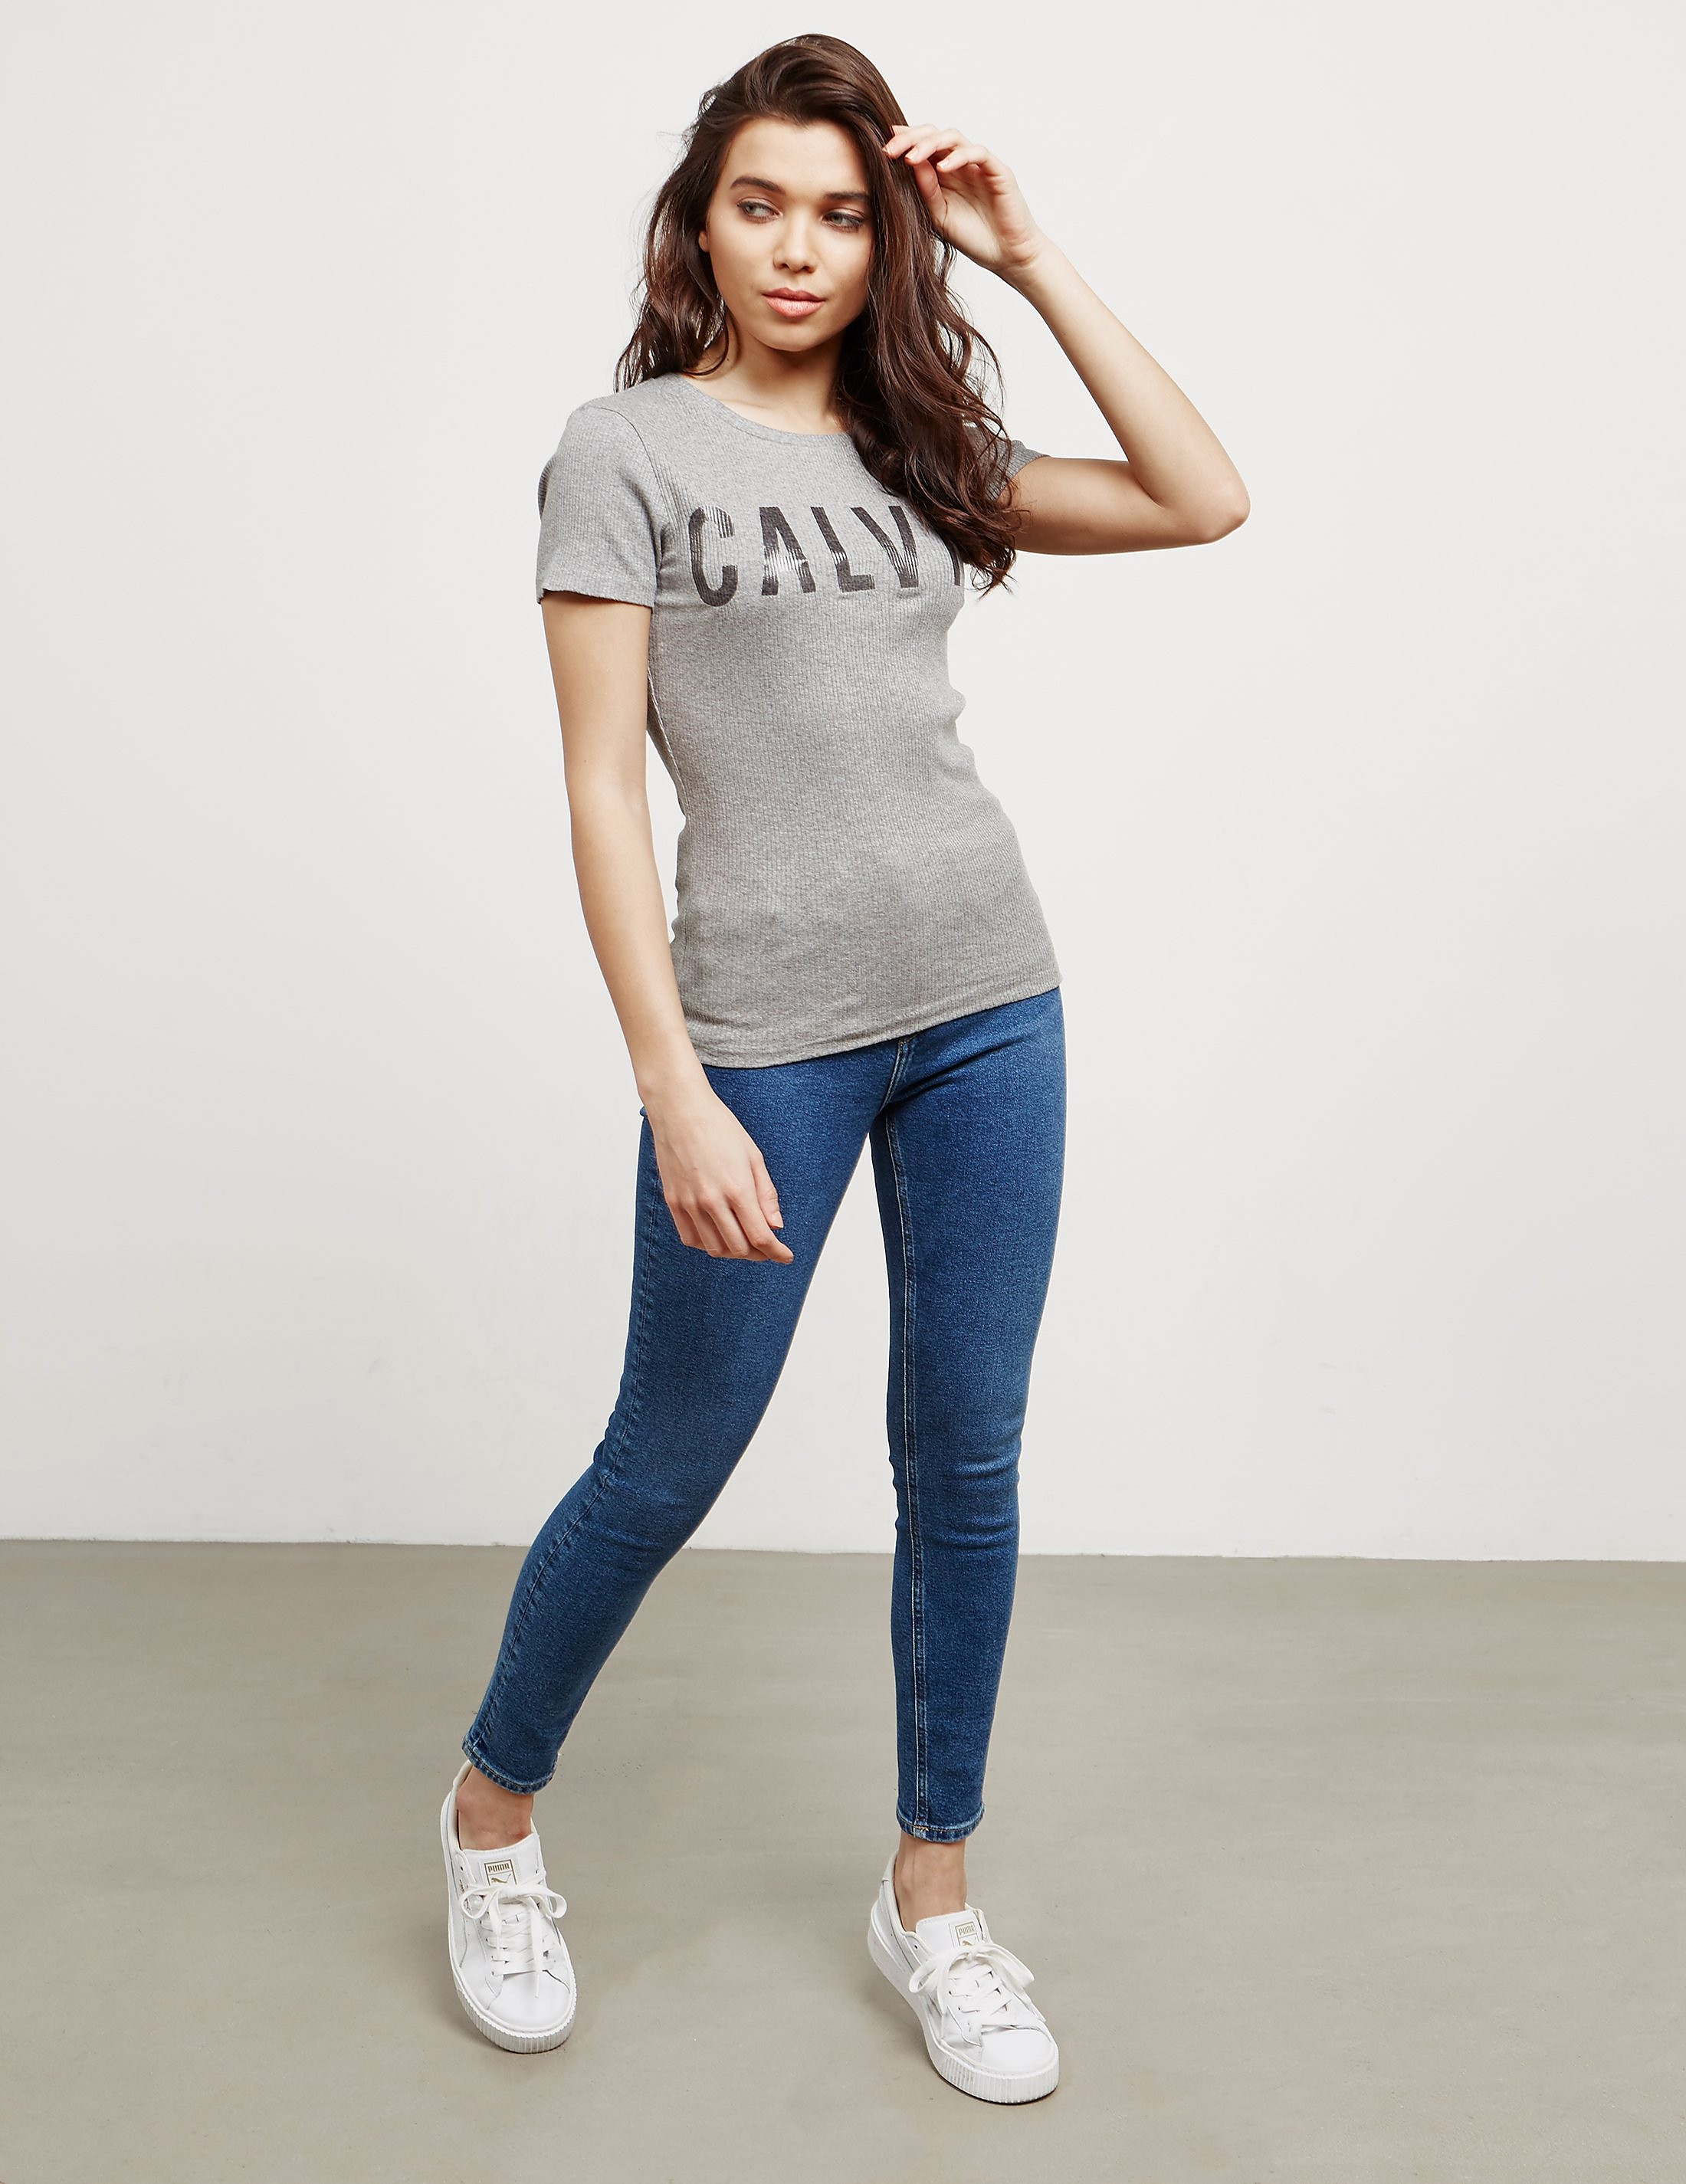 Calvin Klein Tanya-39 Short Sleeve T-Shirt